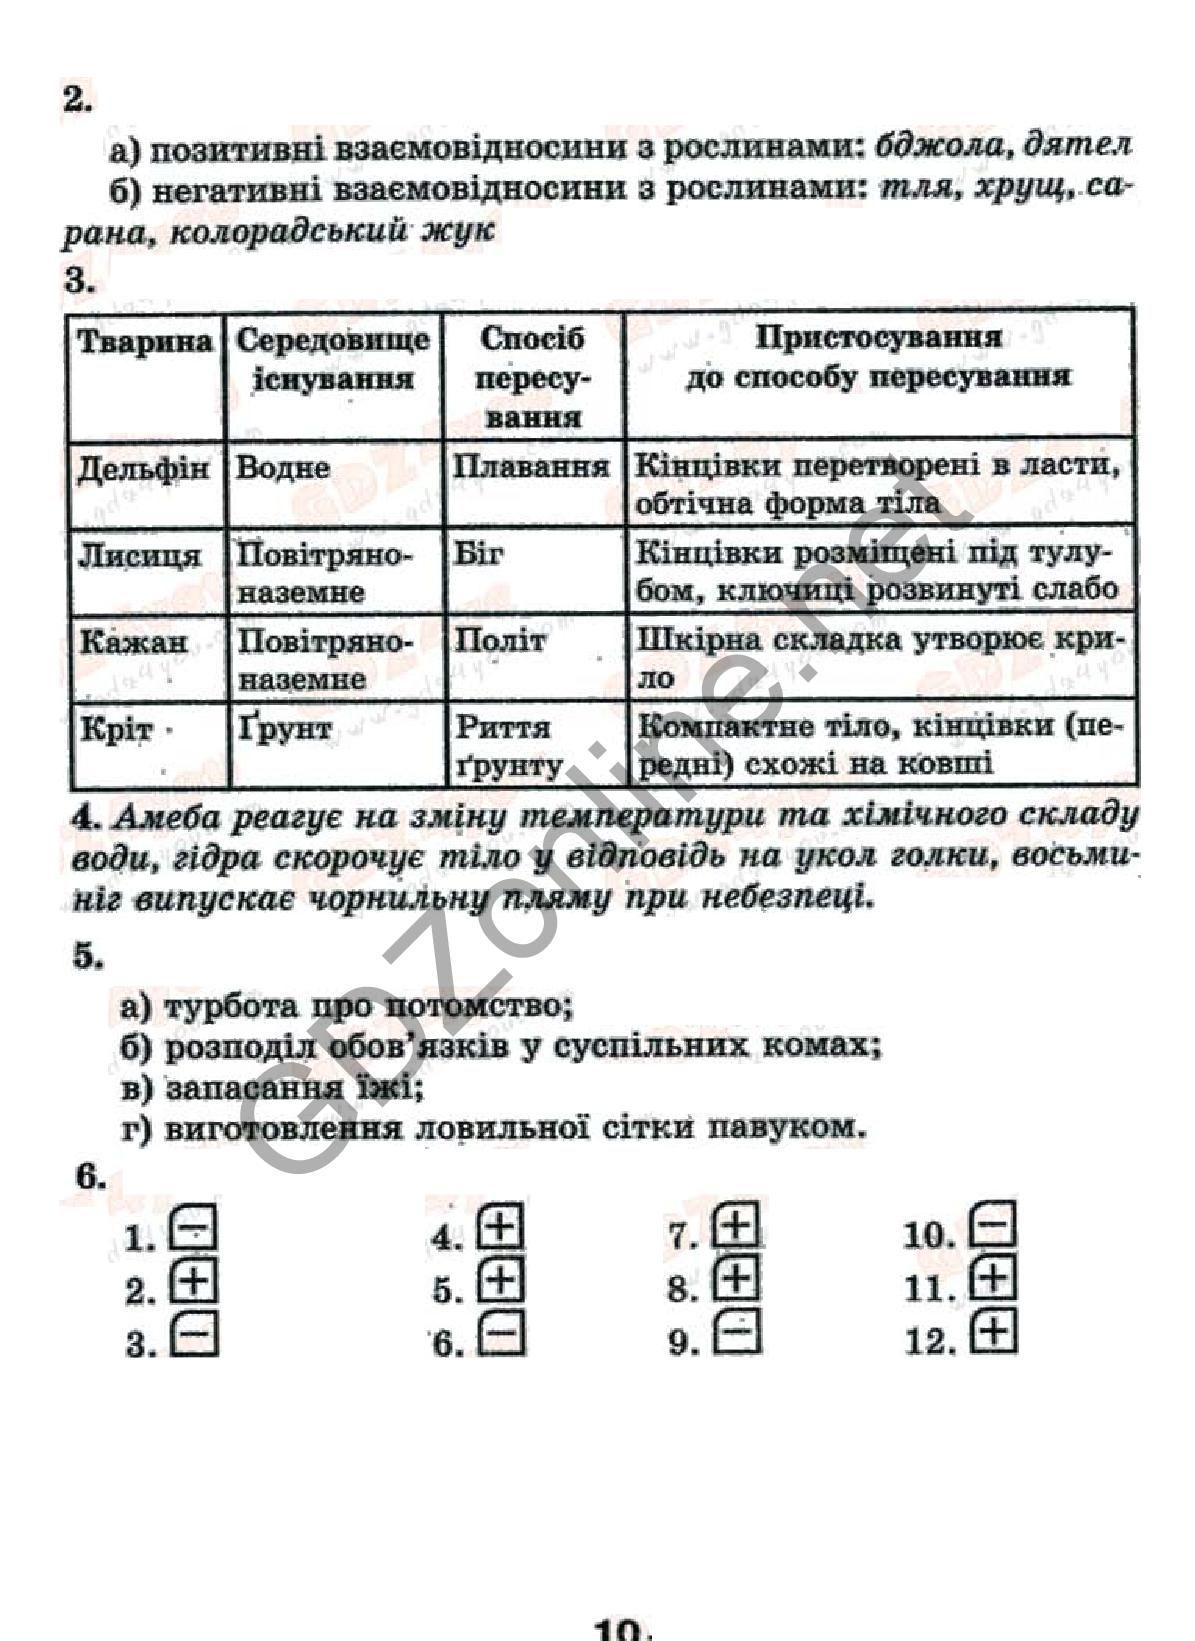 Решебники 8 класс по биологии котик и таглина